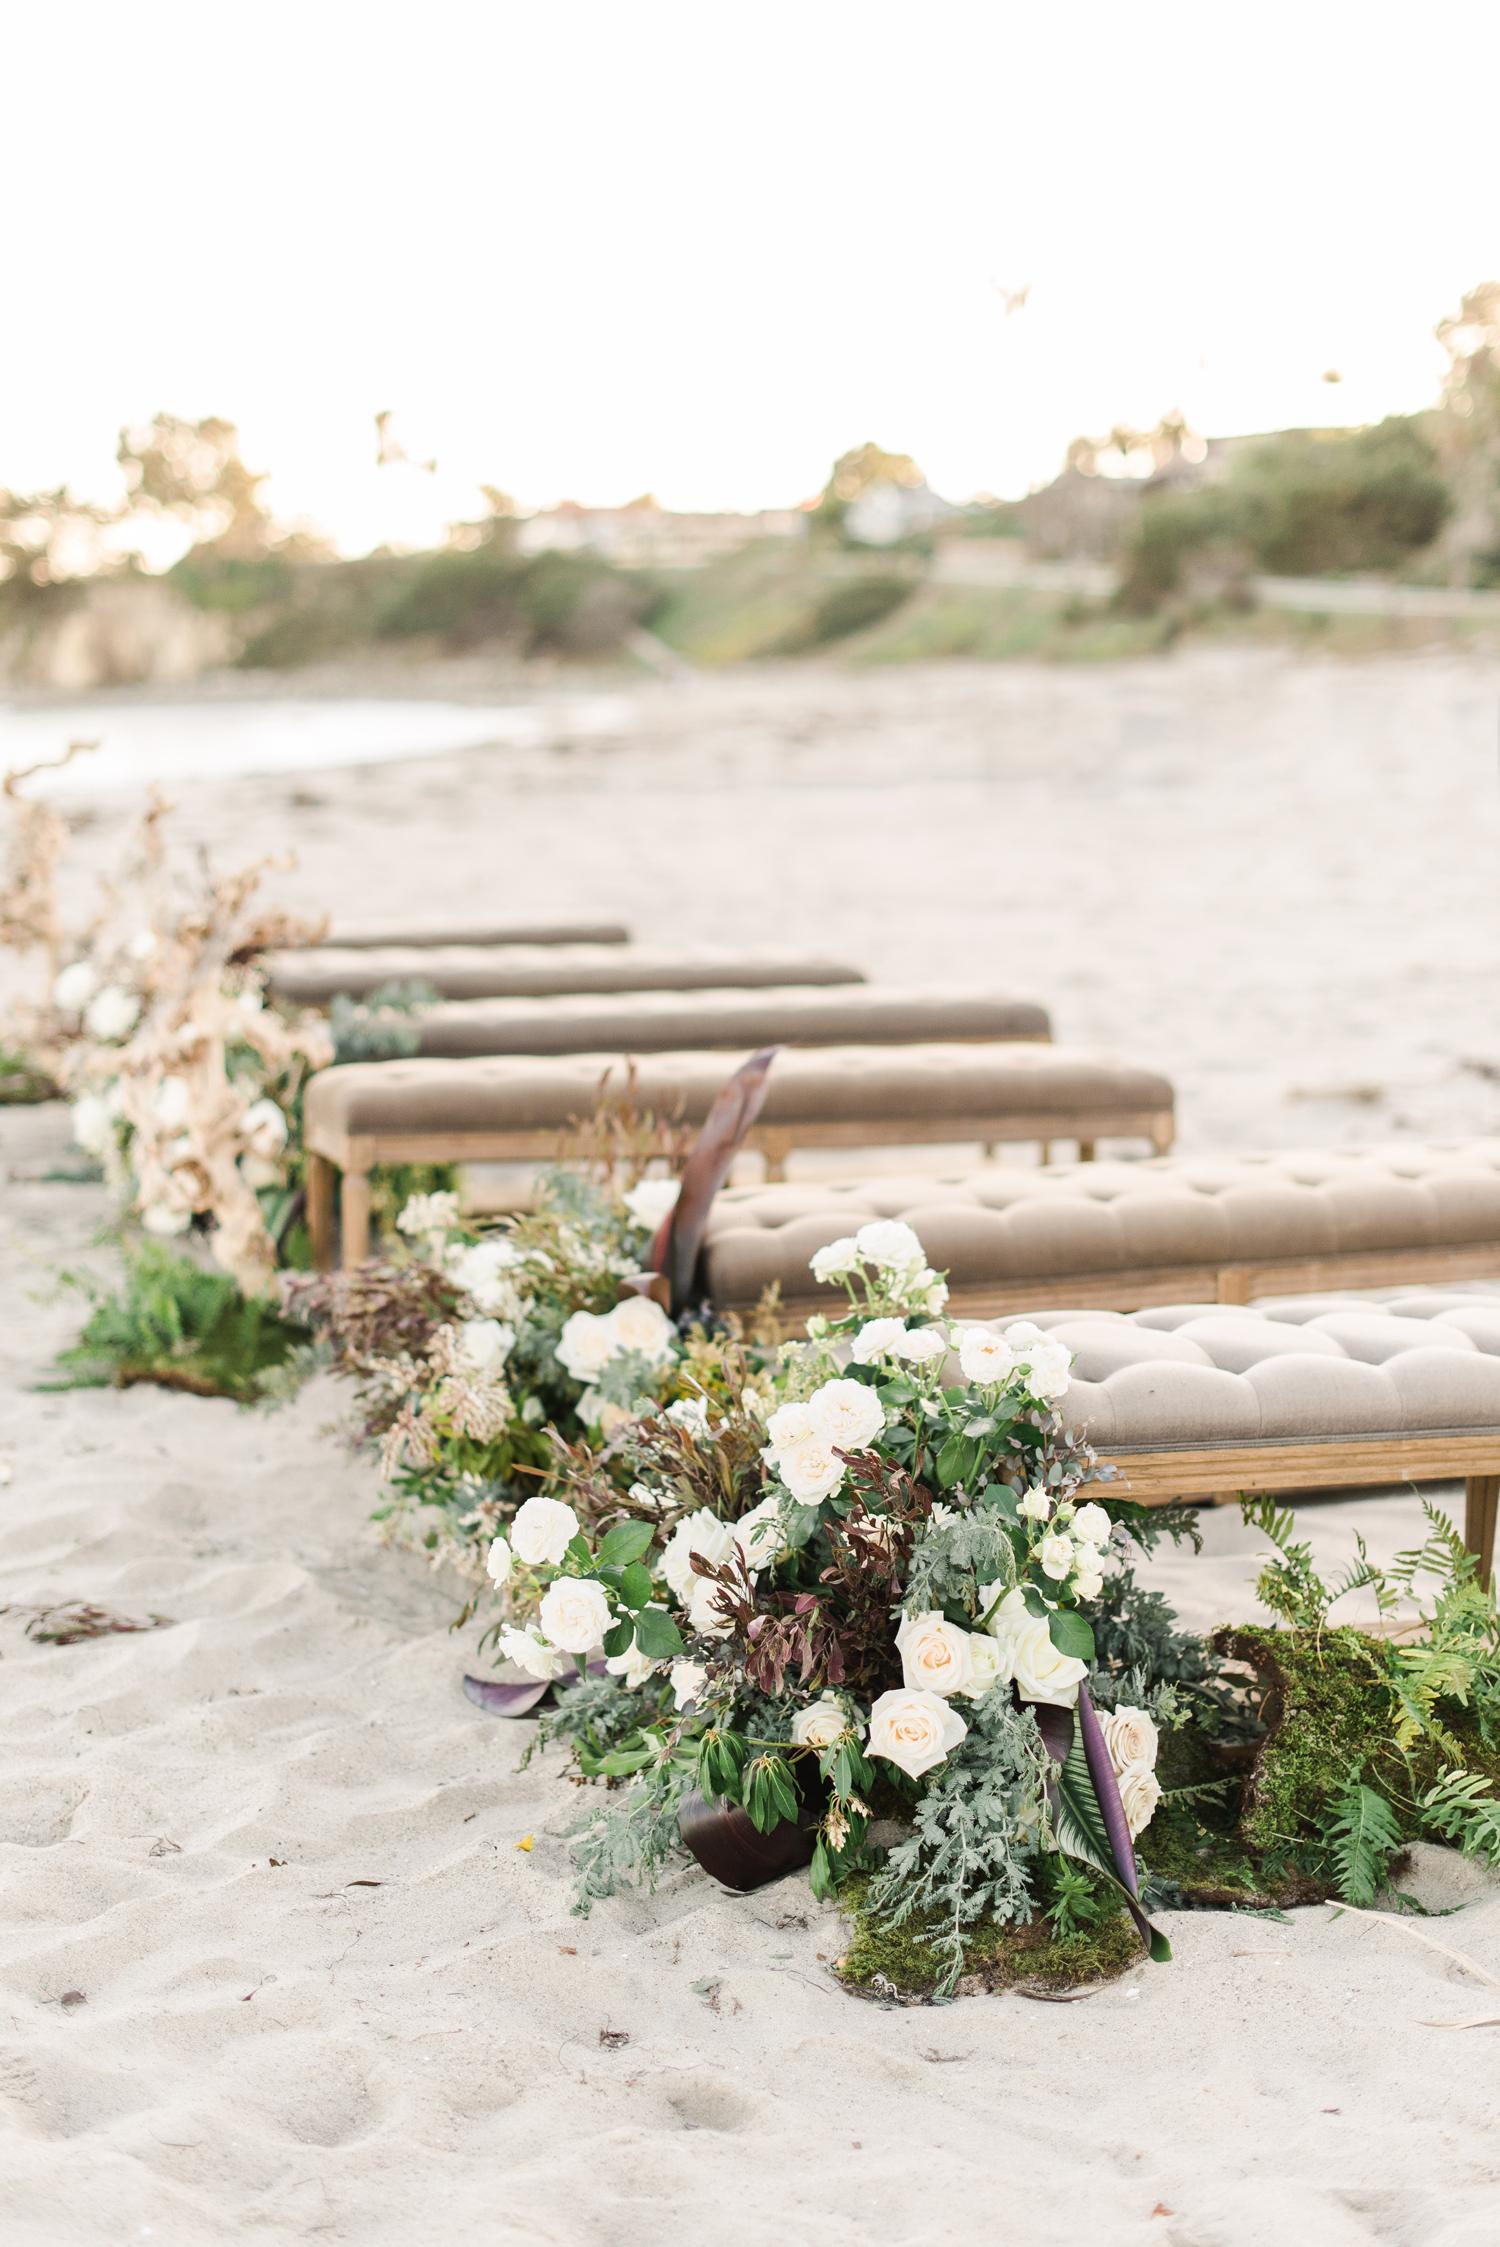 beach wedding ideas benches arranged on beach